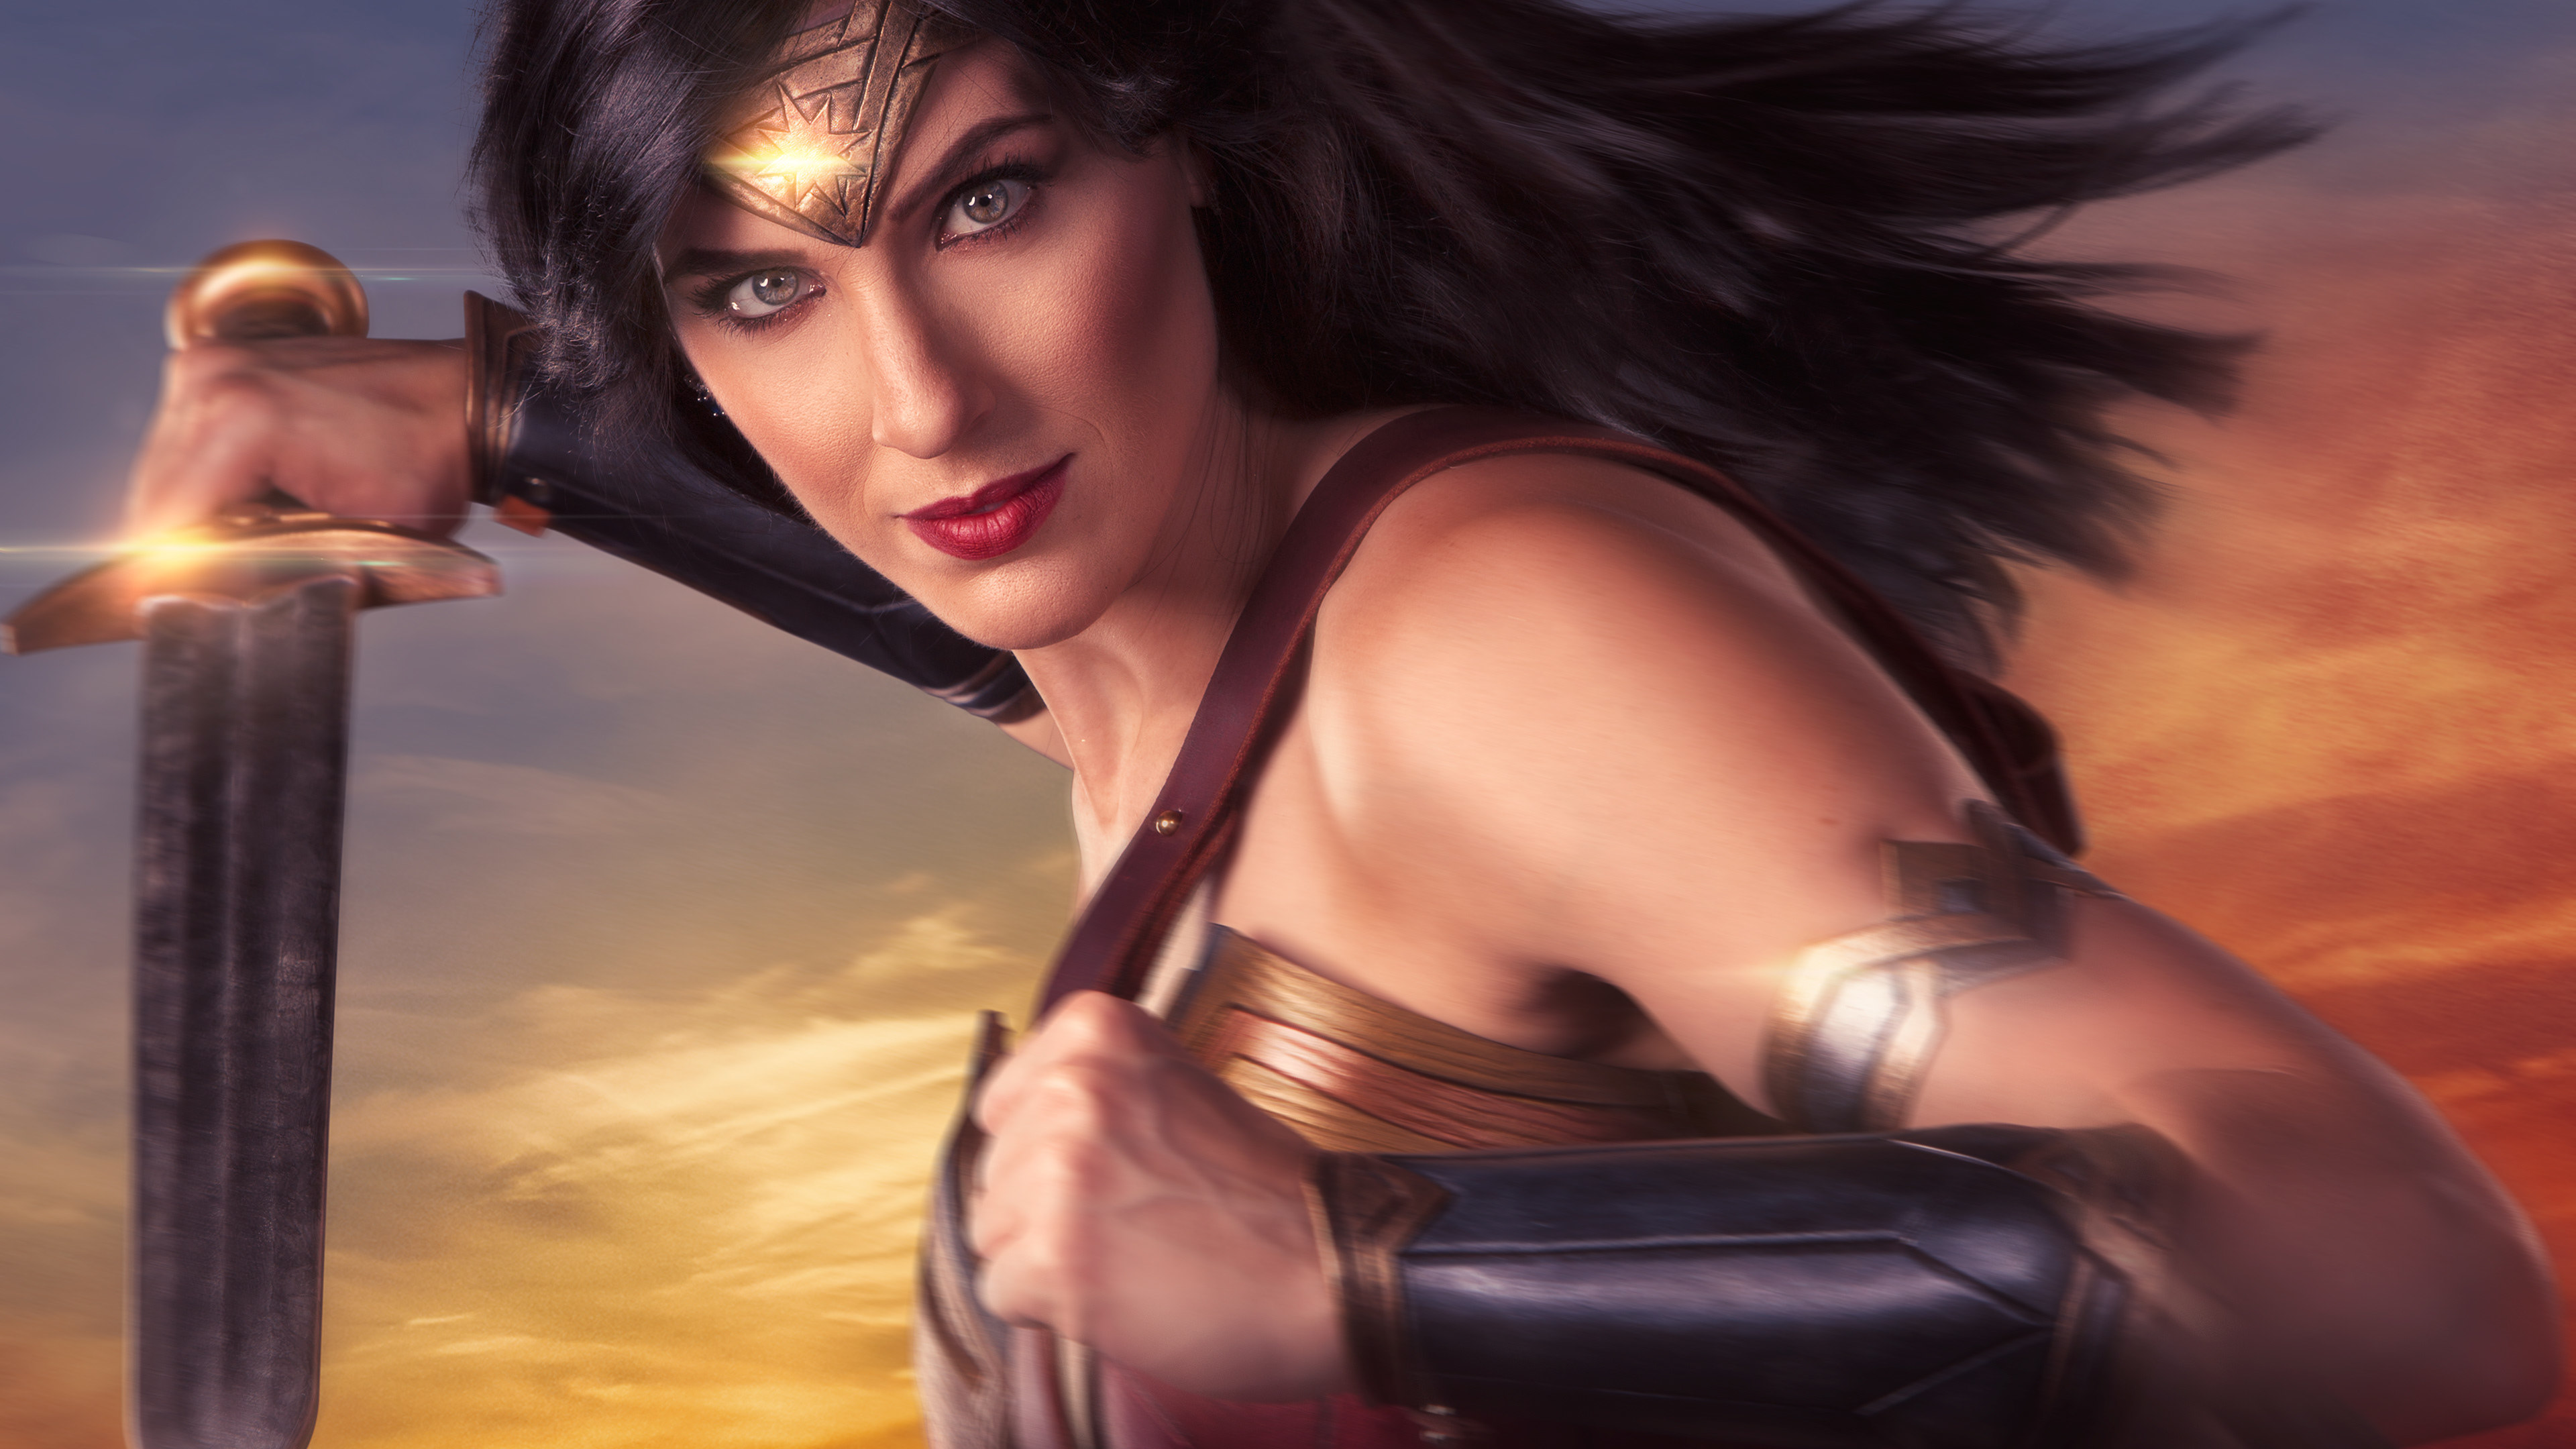 Wallpaper 4k Wonder Woman Cosplay 4k 4k Wallpapers Artist